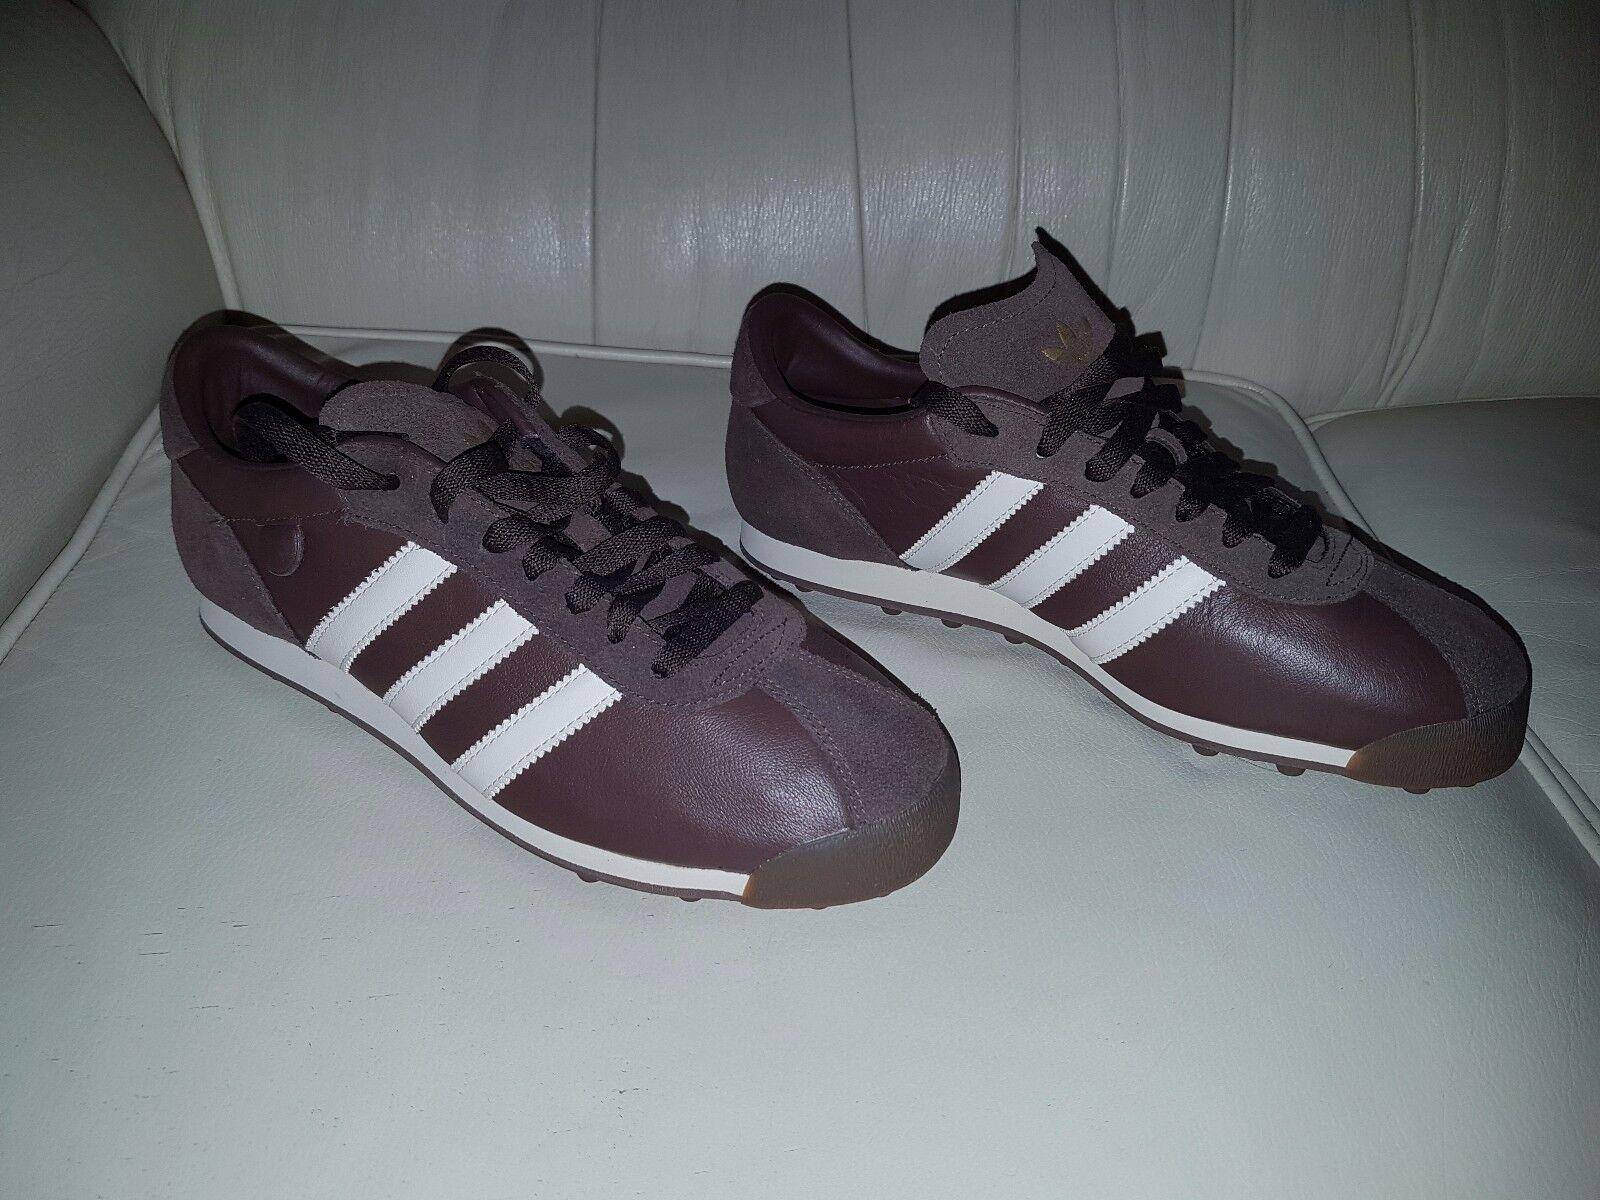 Adidas Originals La Trainer Größe 7 UK MENS